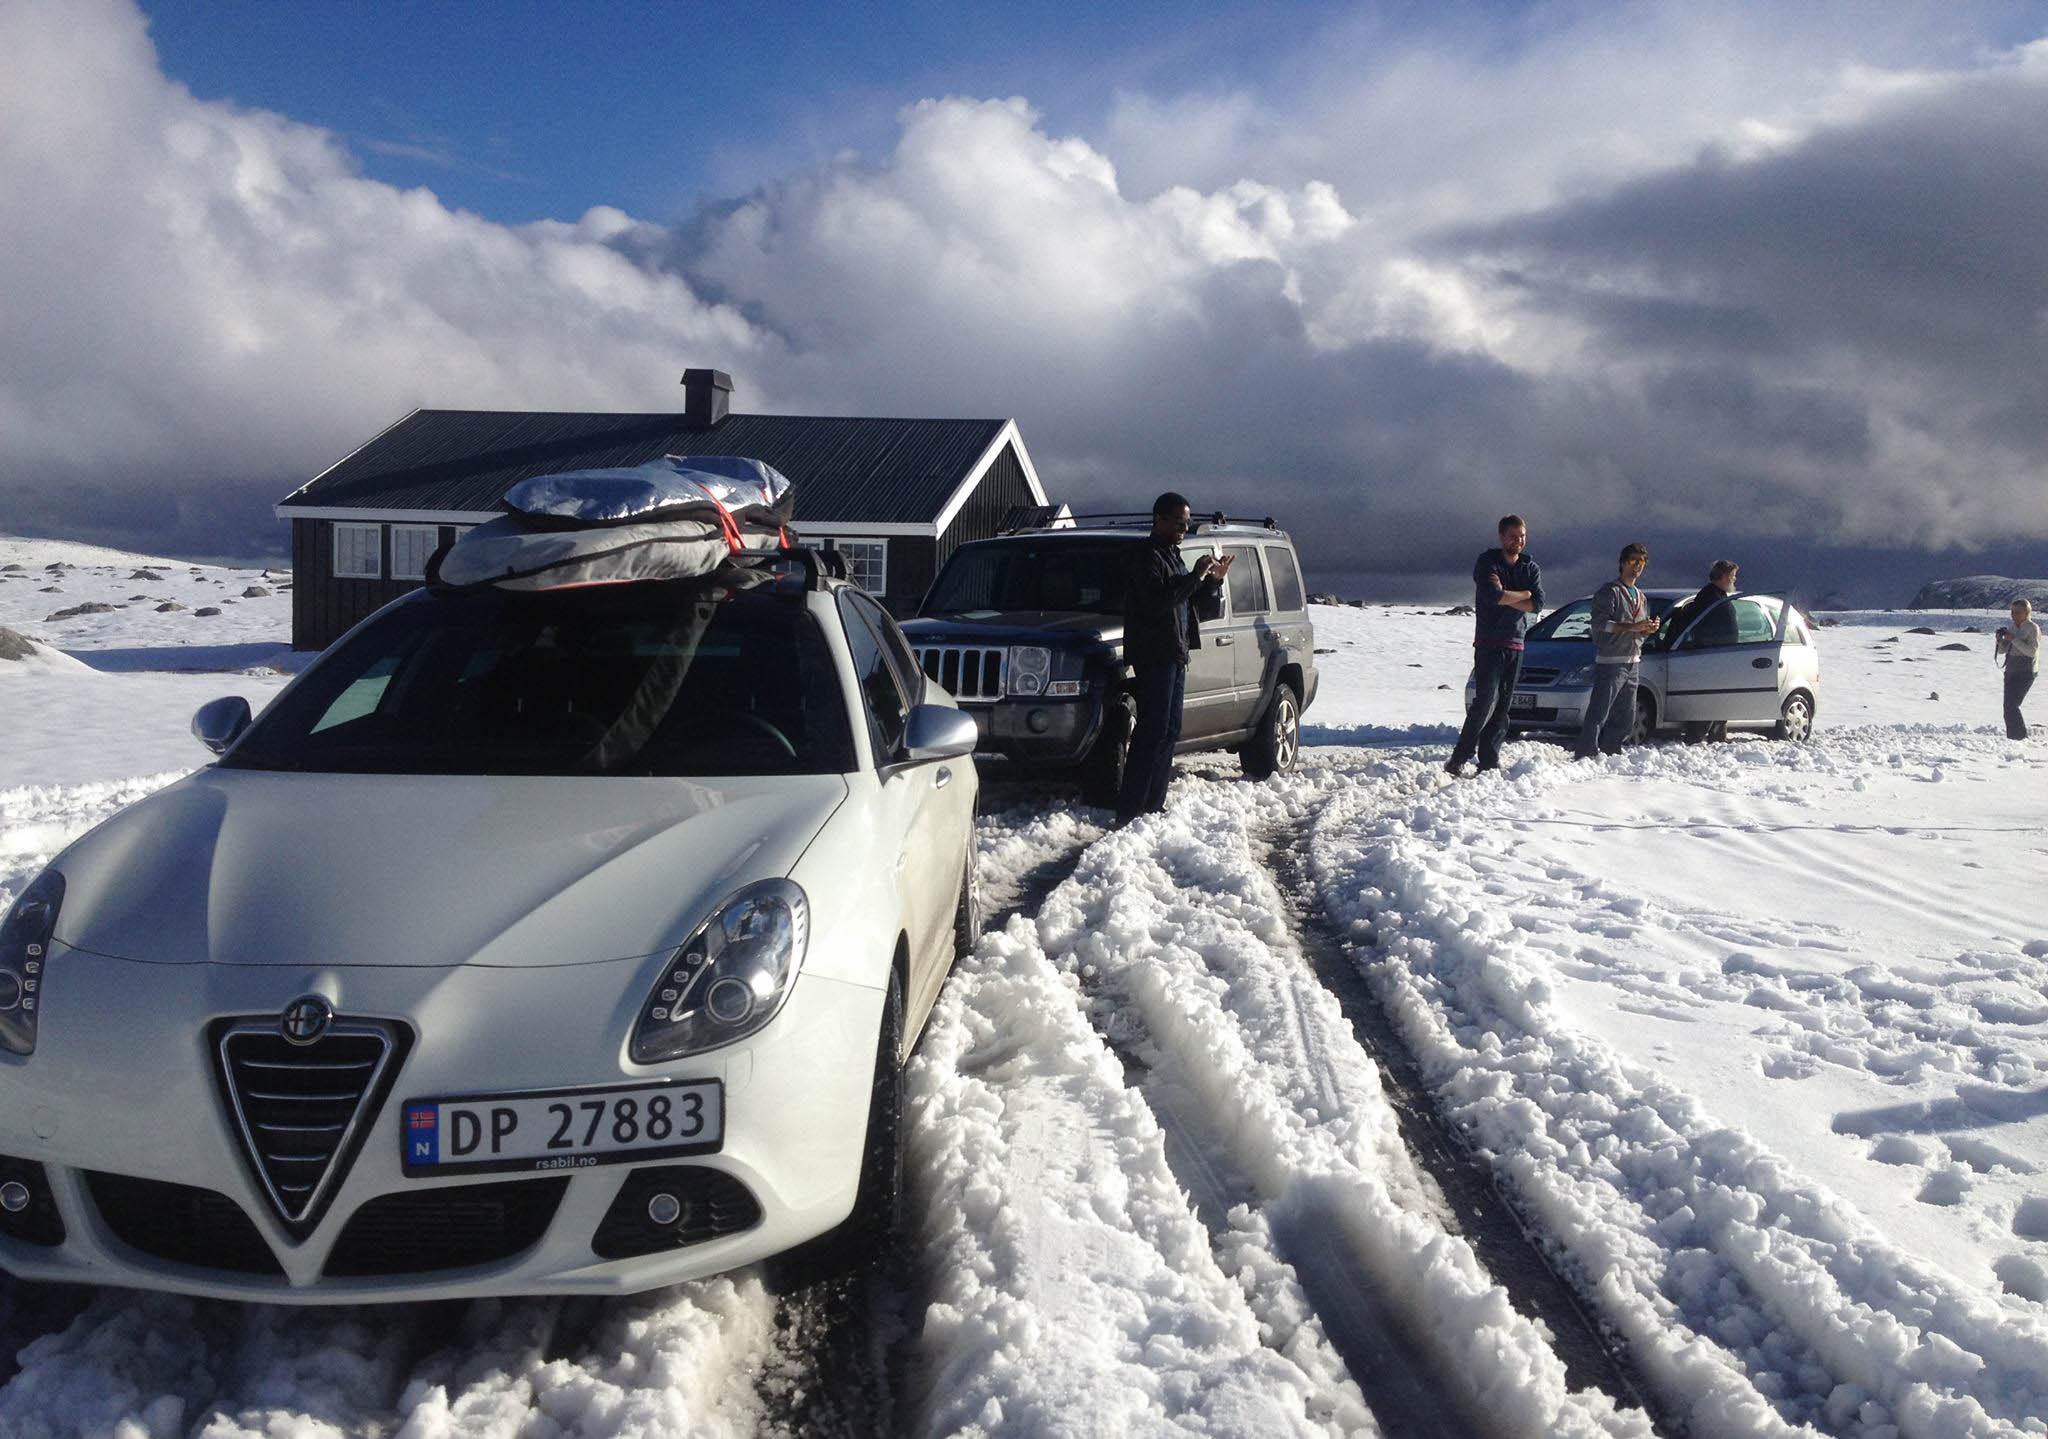 På Valdresflye får vi sesongens første snøballkrig. ©Foto: Bjørnar Eidsmo